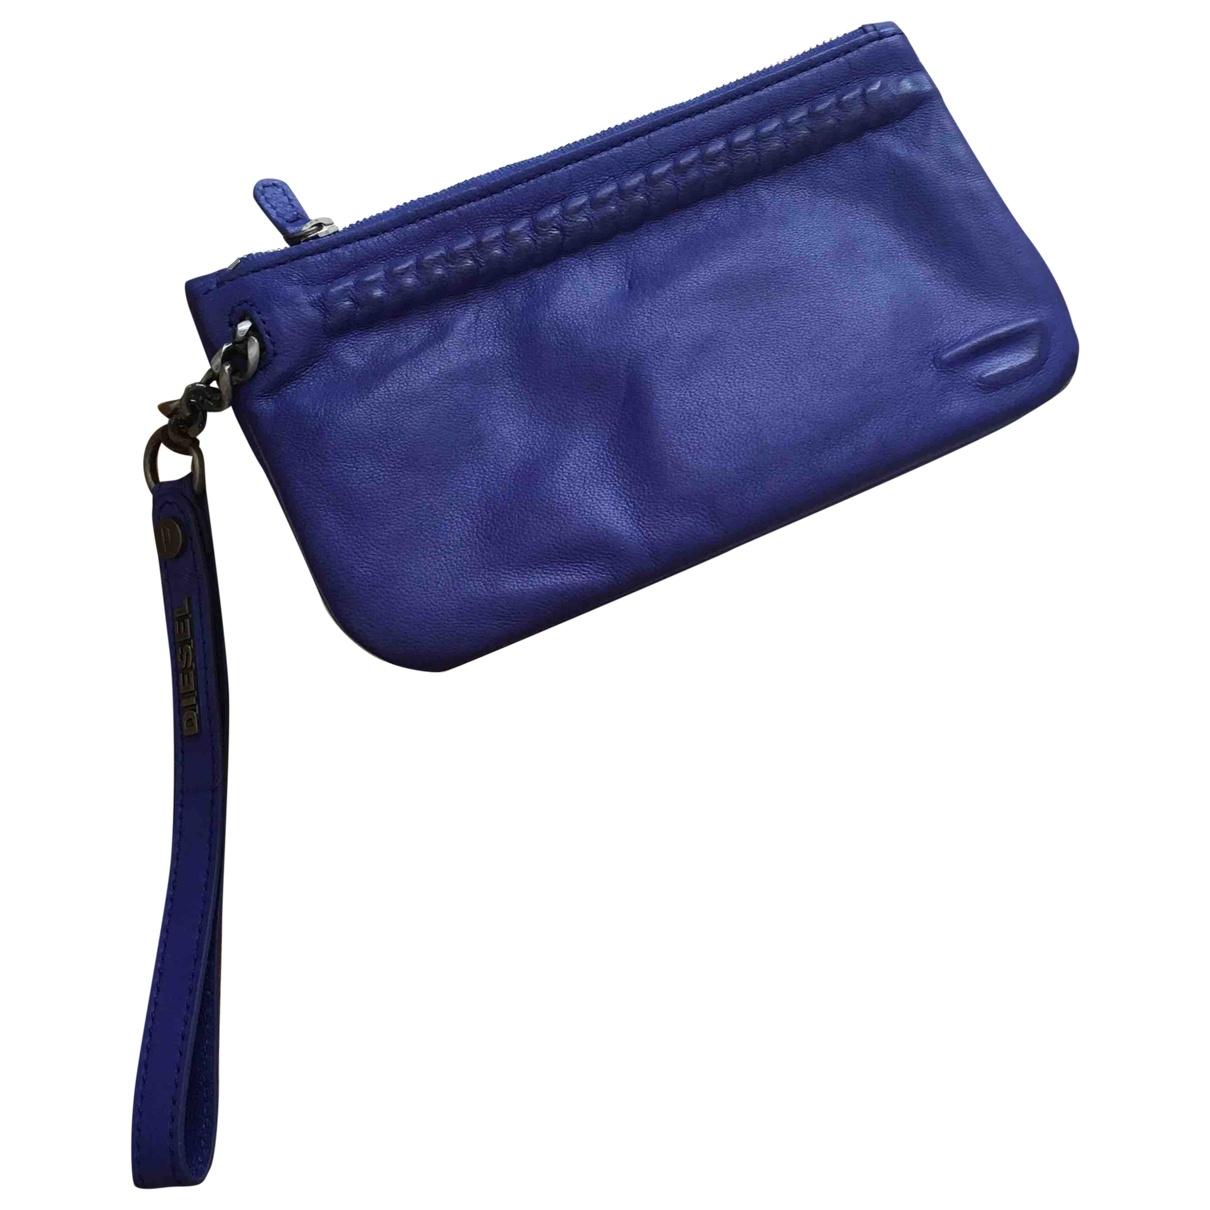 Diesel \N Blue Leather Clutch bag for Women \N